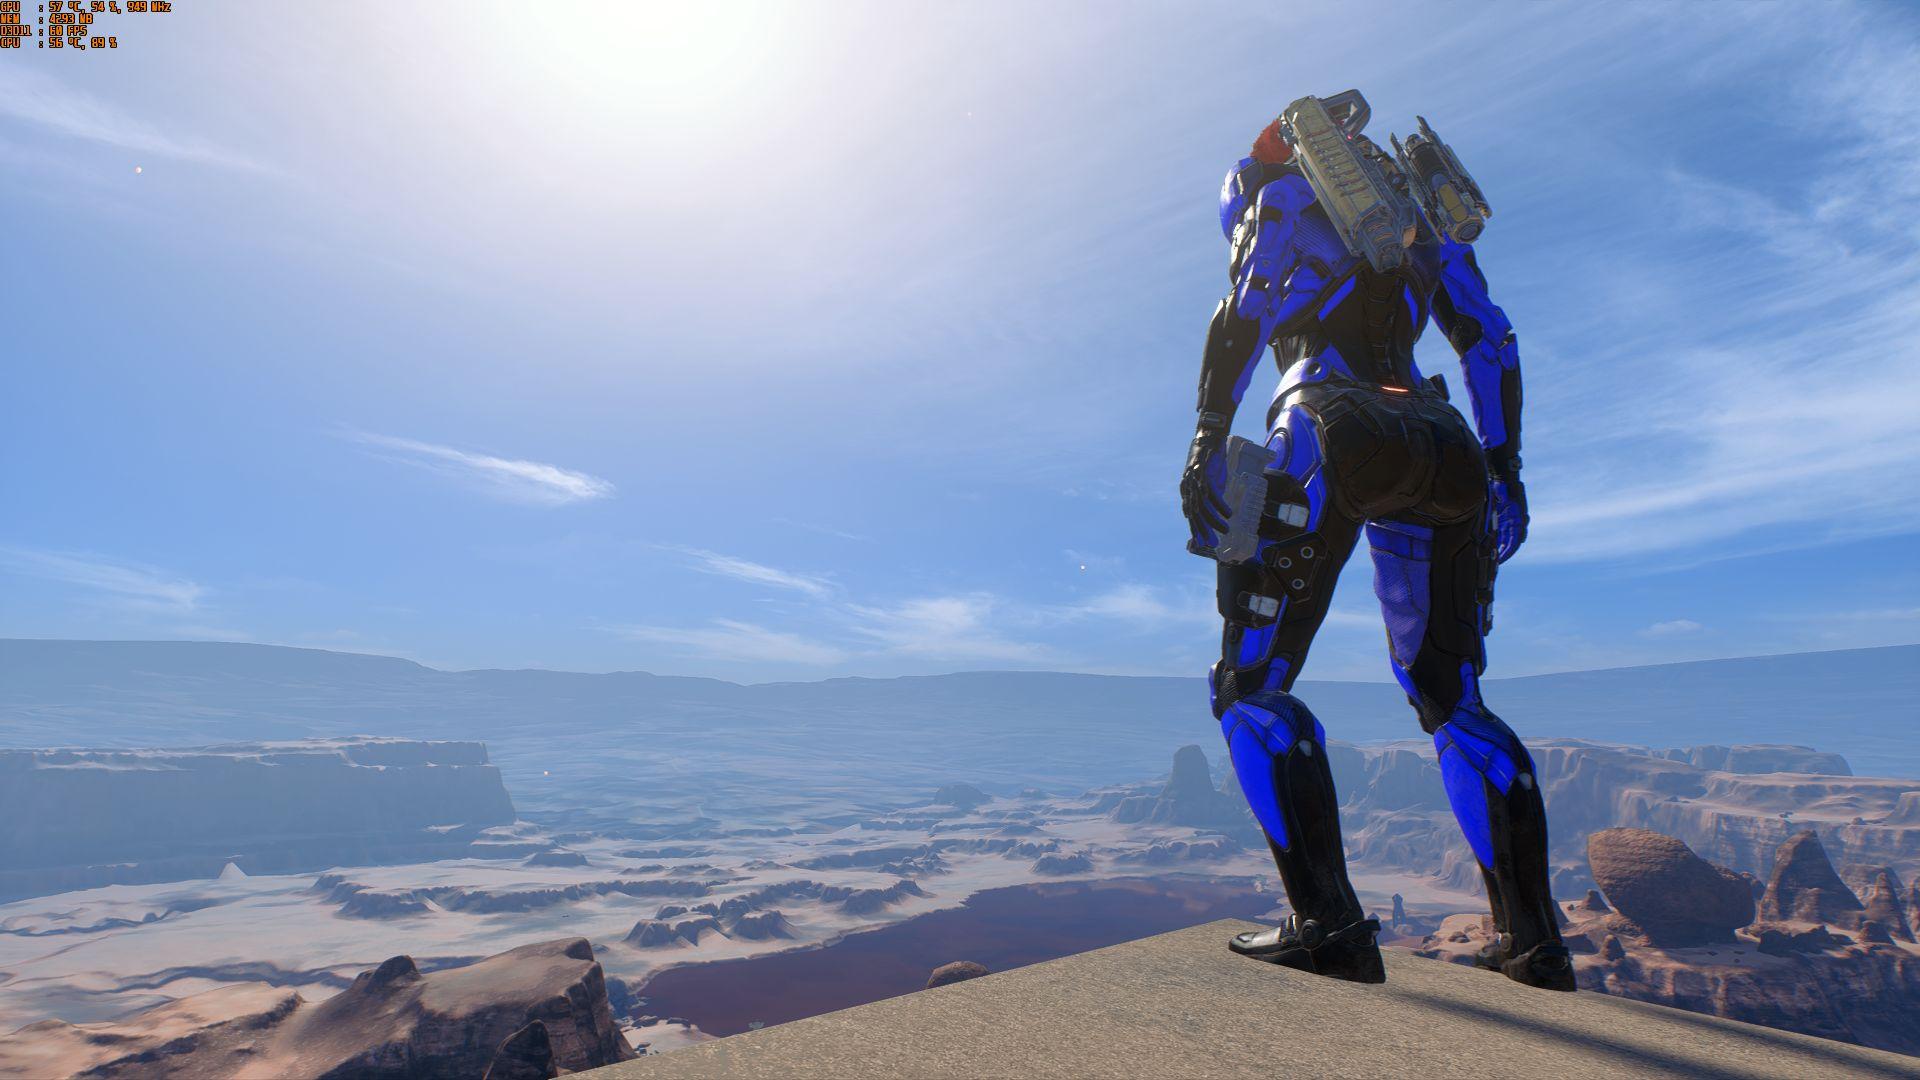 Mass Effect Andromeda Screenshot 2017.07.11 - 20.00.24.68.jpg - Mass Effect: Andromeda